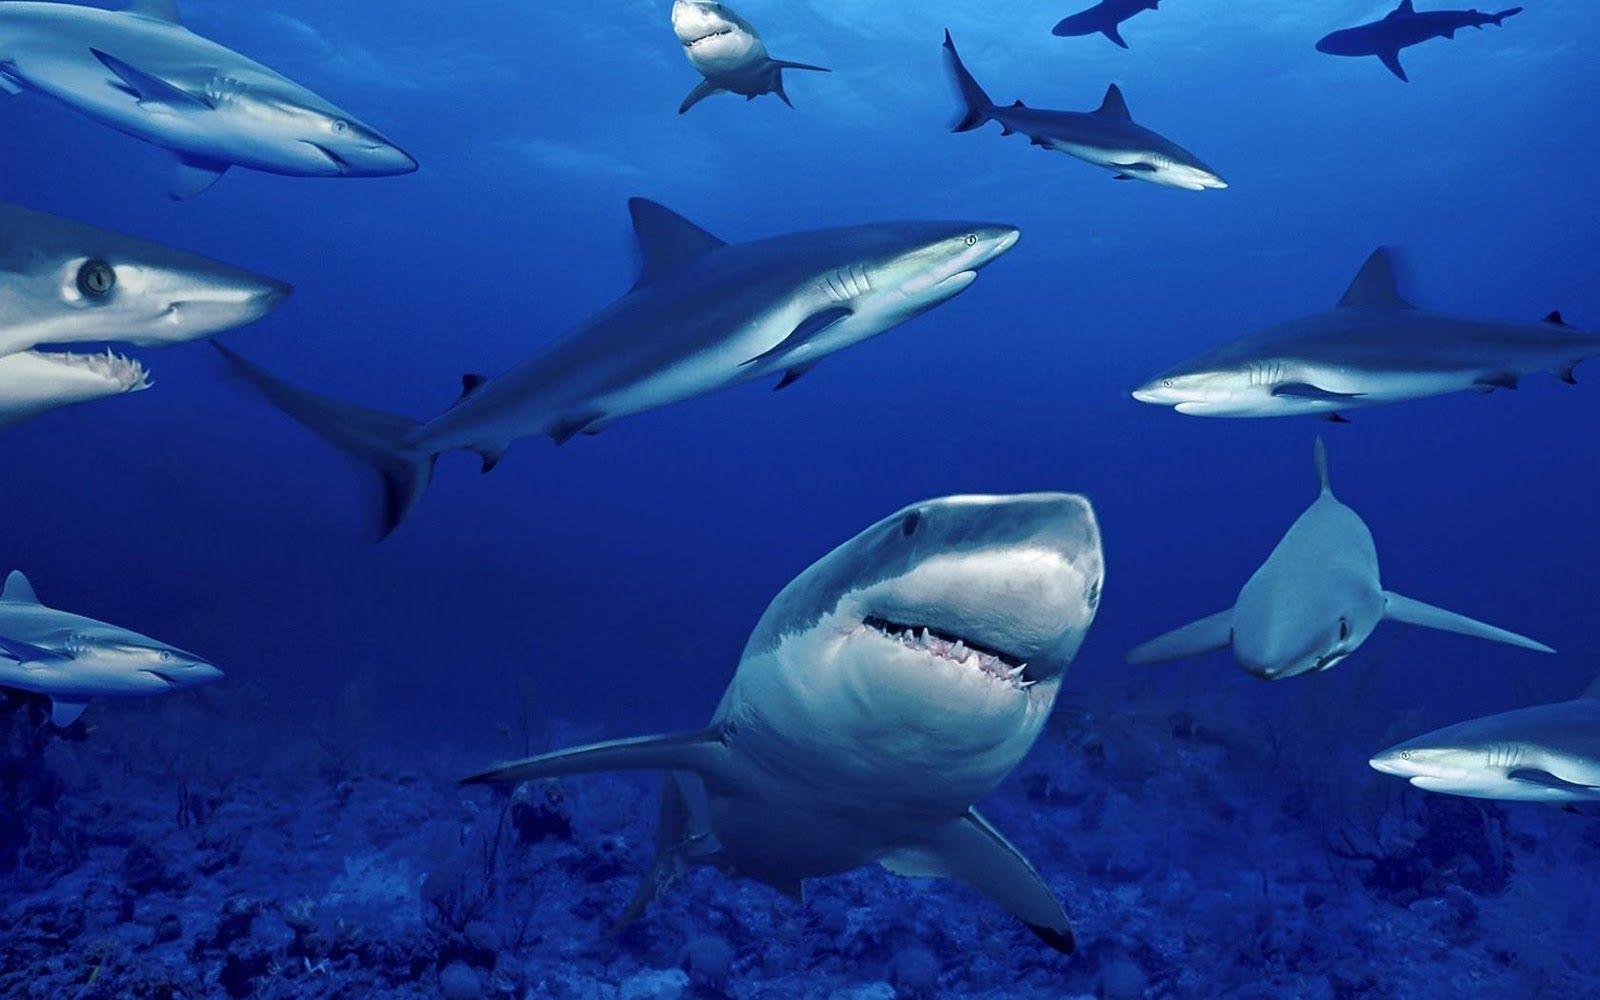 Cartoon Shark Wallpapers Top Free Cartoon Shark